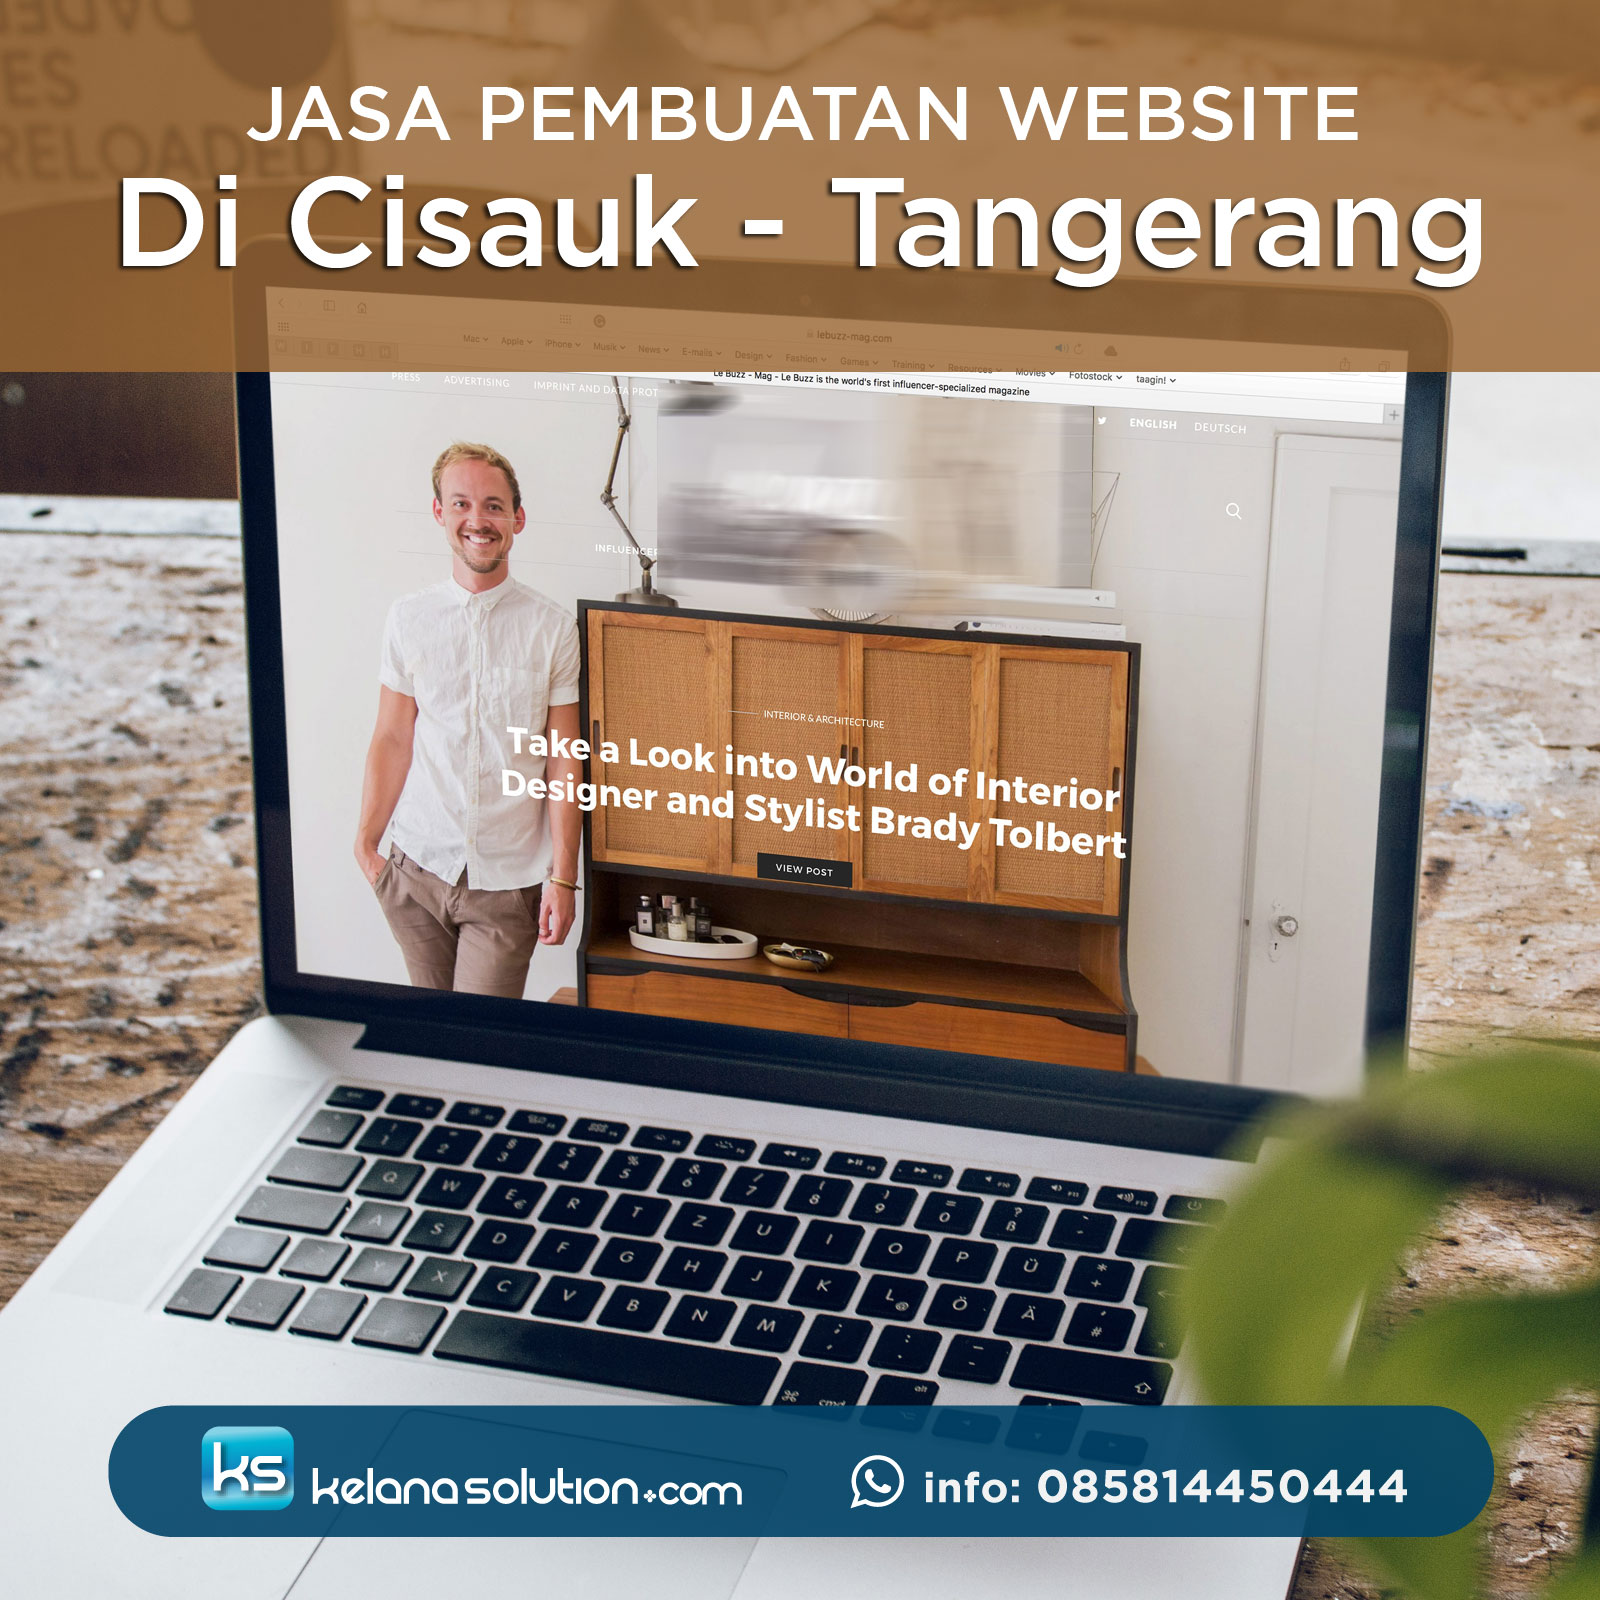 Jasa Pembuatan Website di Cisauk Tangerang